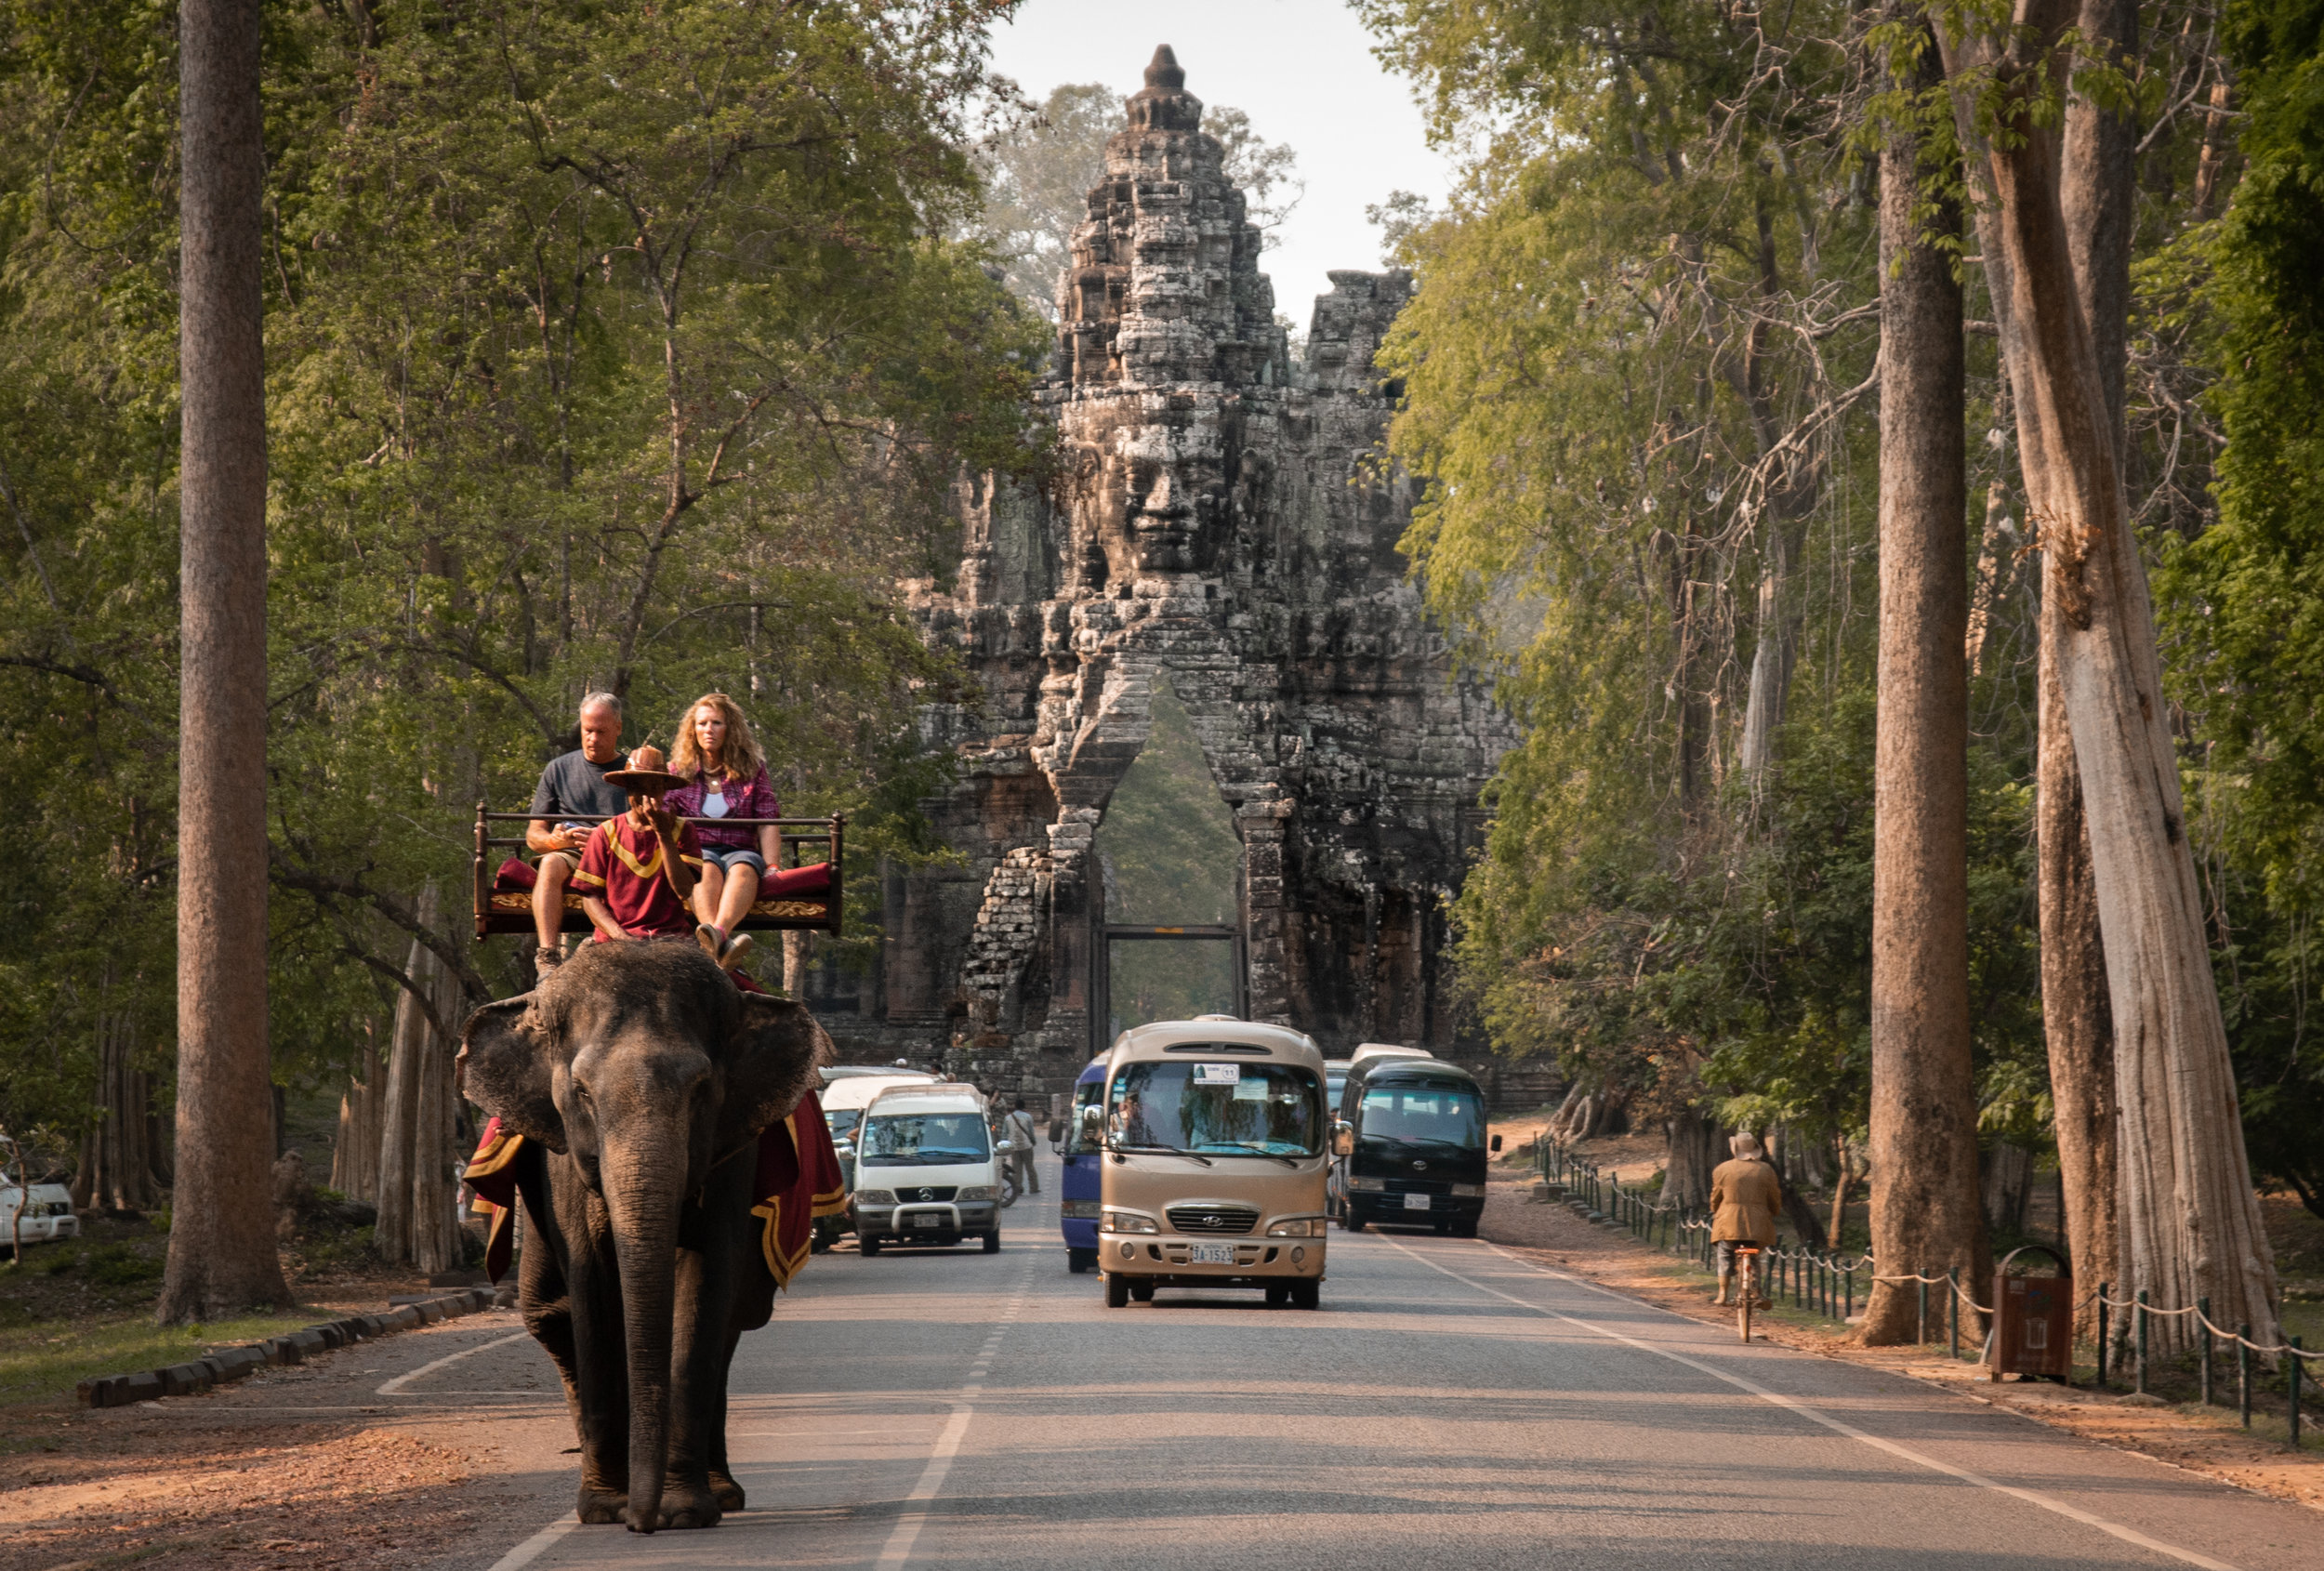 Angkor Wat 1 free with Moving Animals credit.jpg